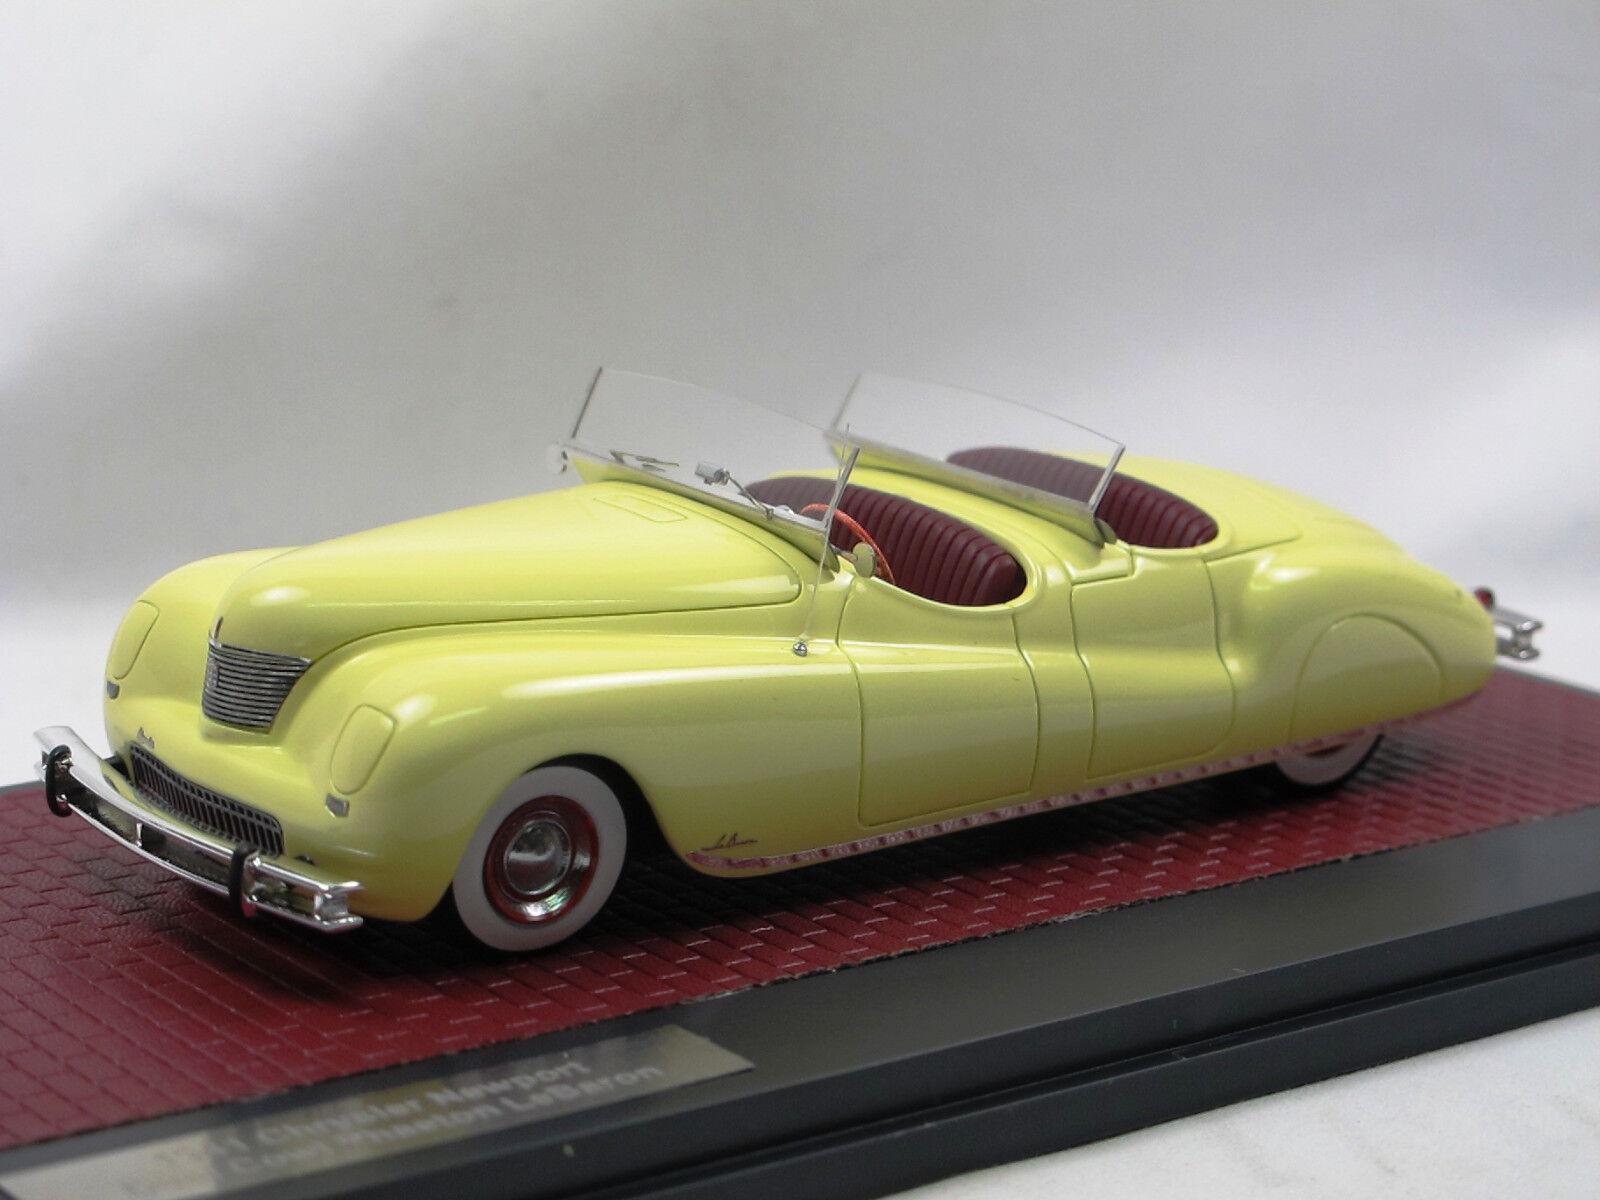 Matriz 1941 Chrysler Newport dual Cowl Phaeton LeBaron amarillo 1 43 Limited 240